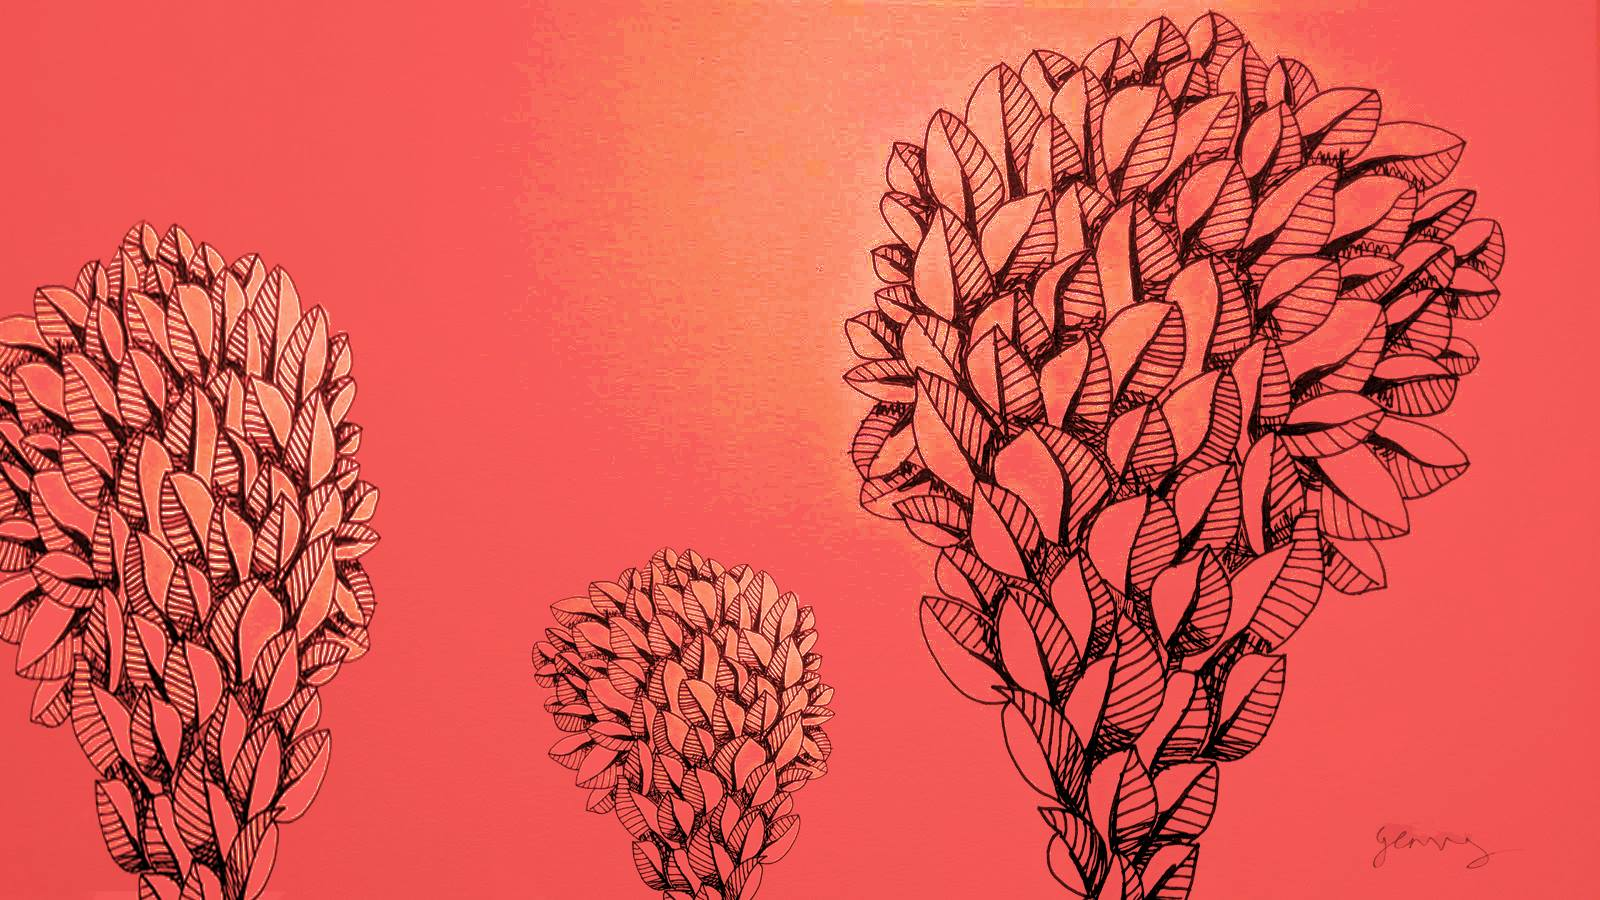 Doodle art work by Gary Crossey